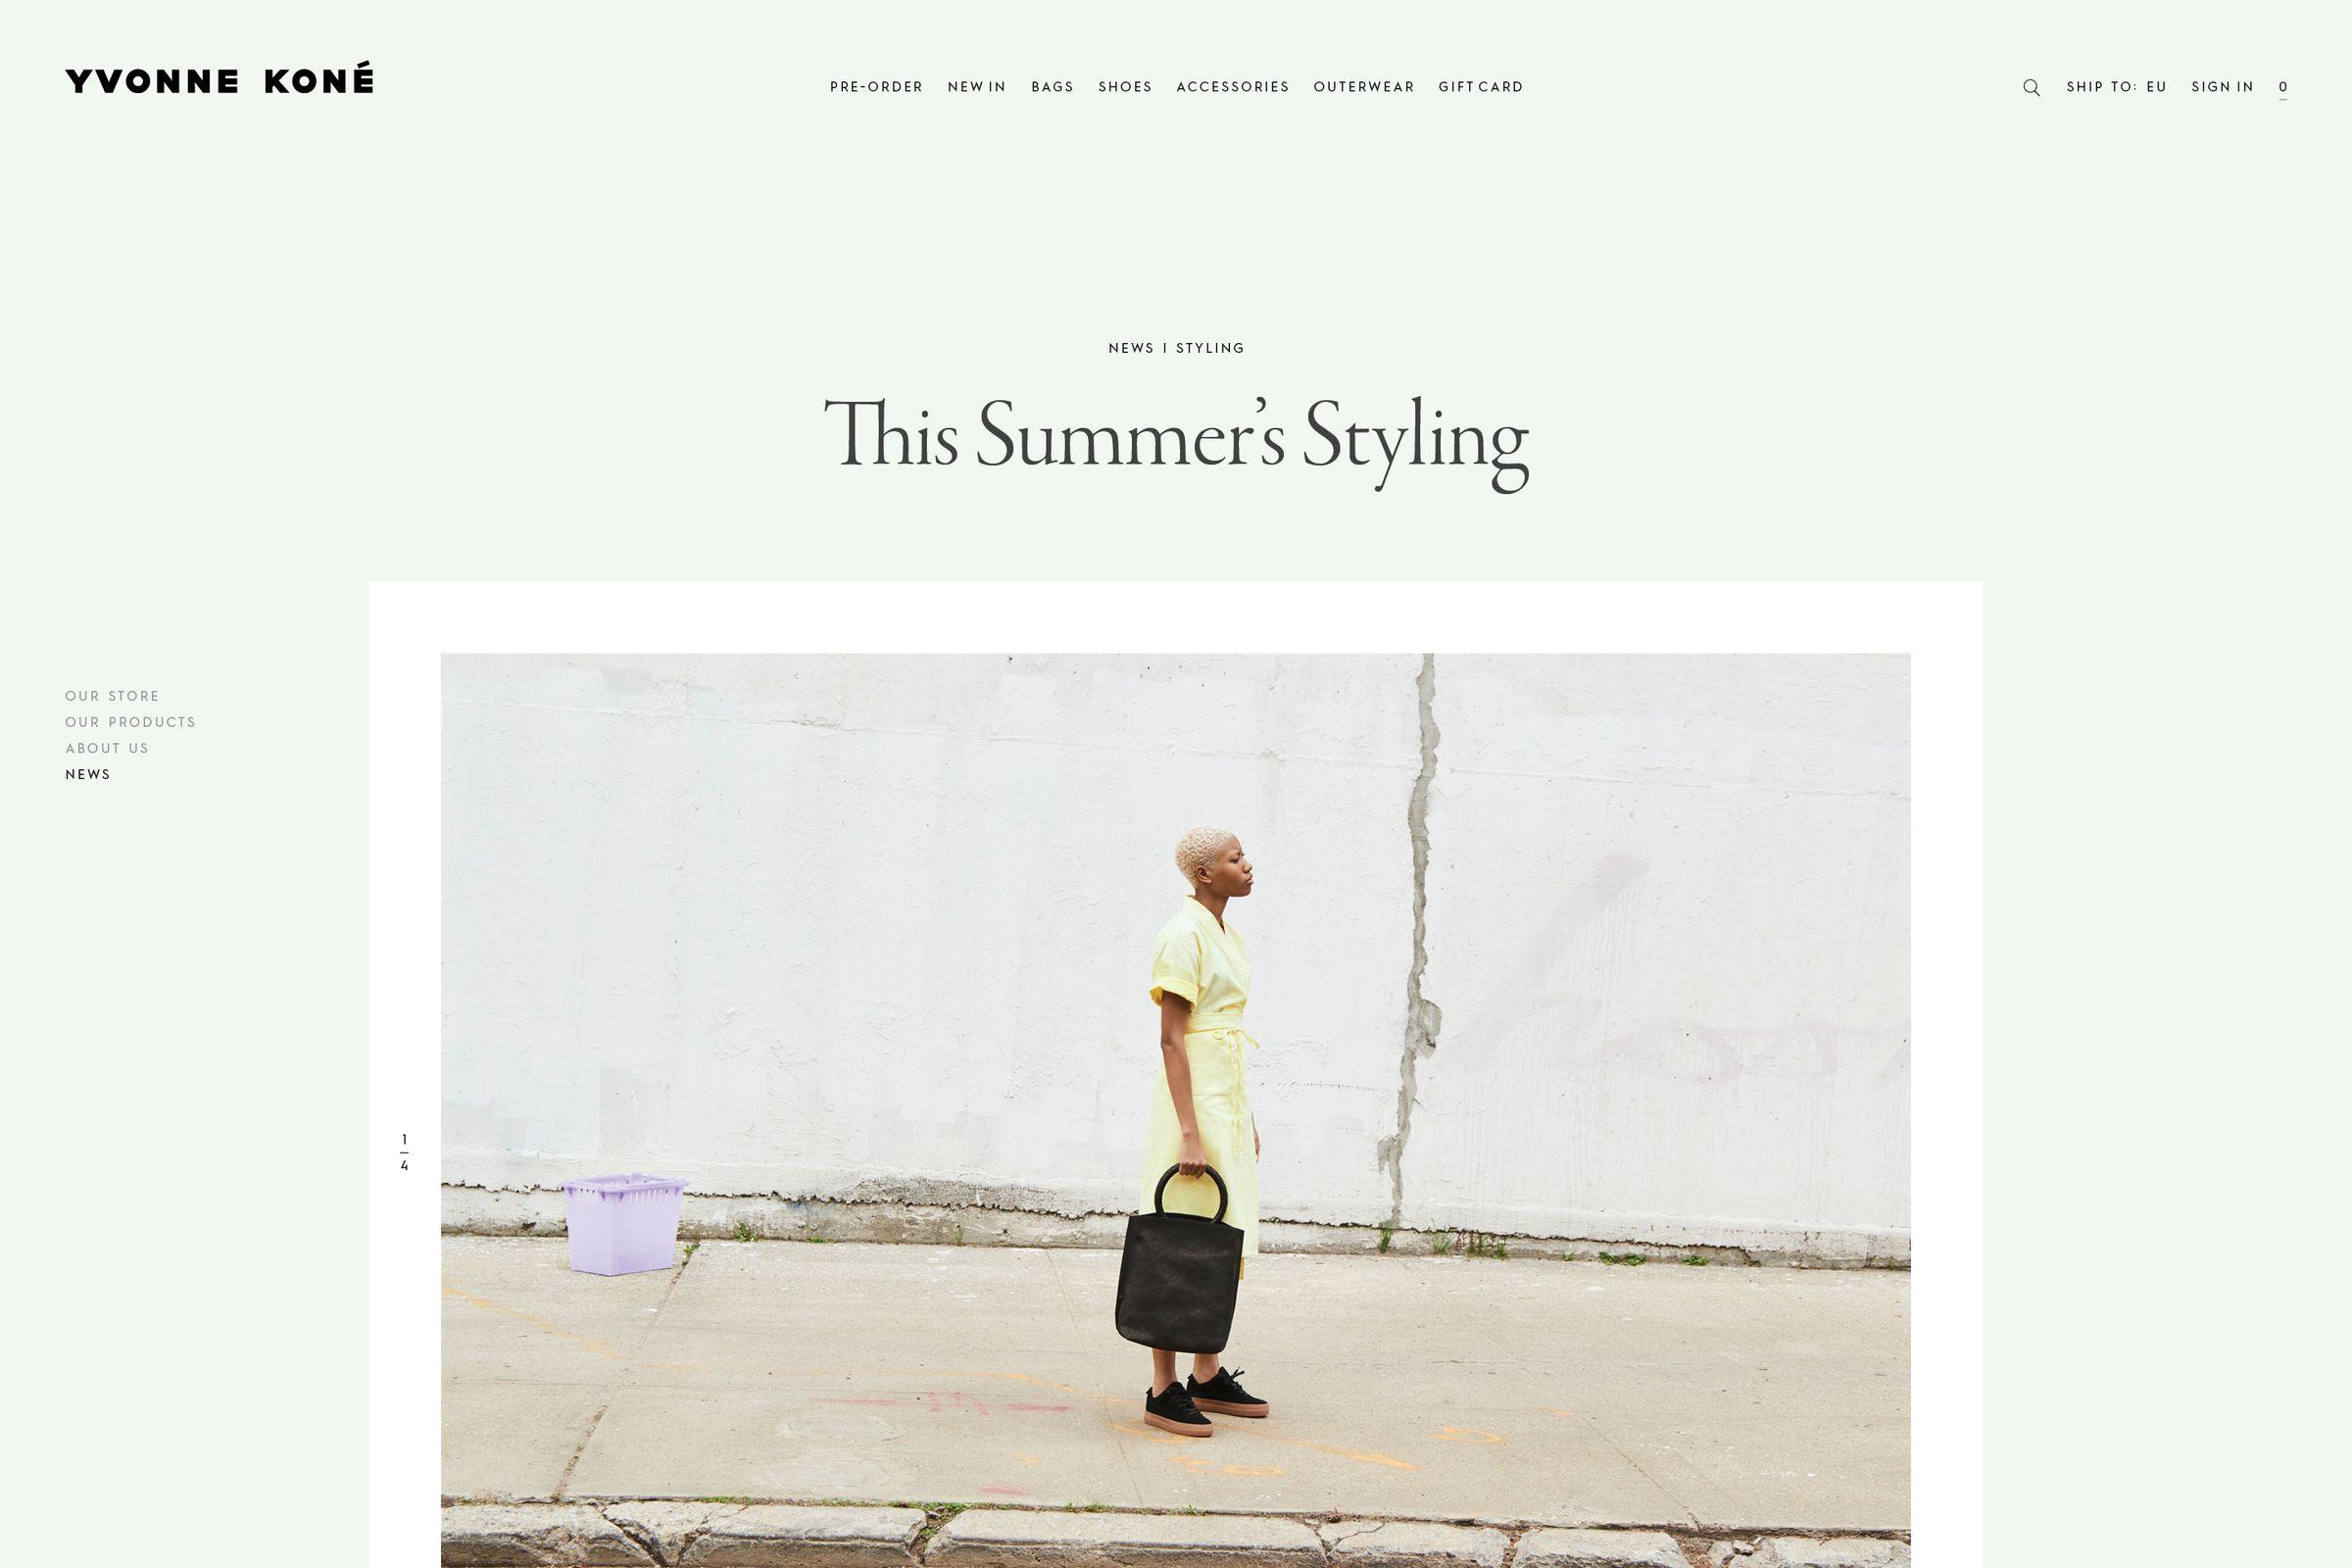 Yvonne Kone website design editorial page